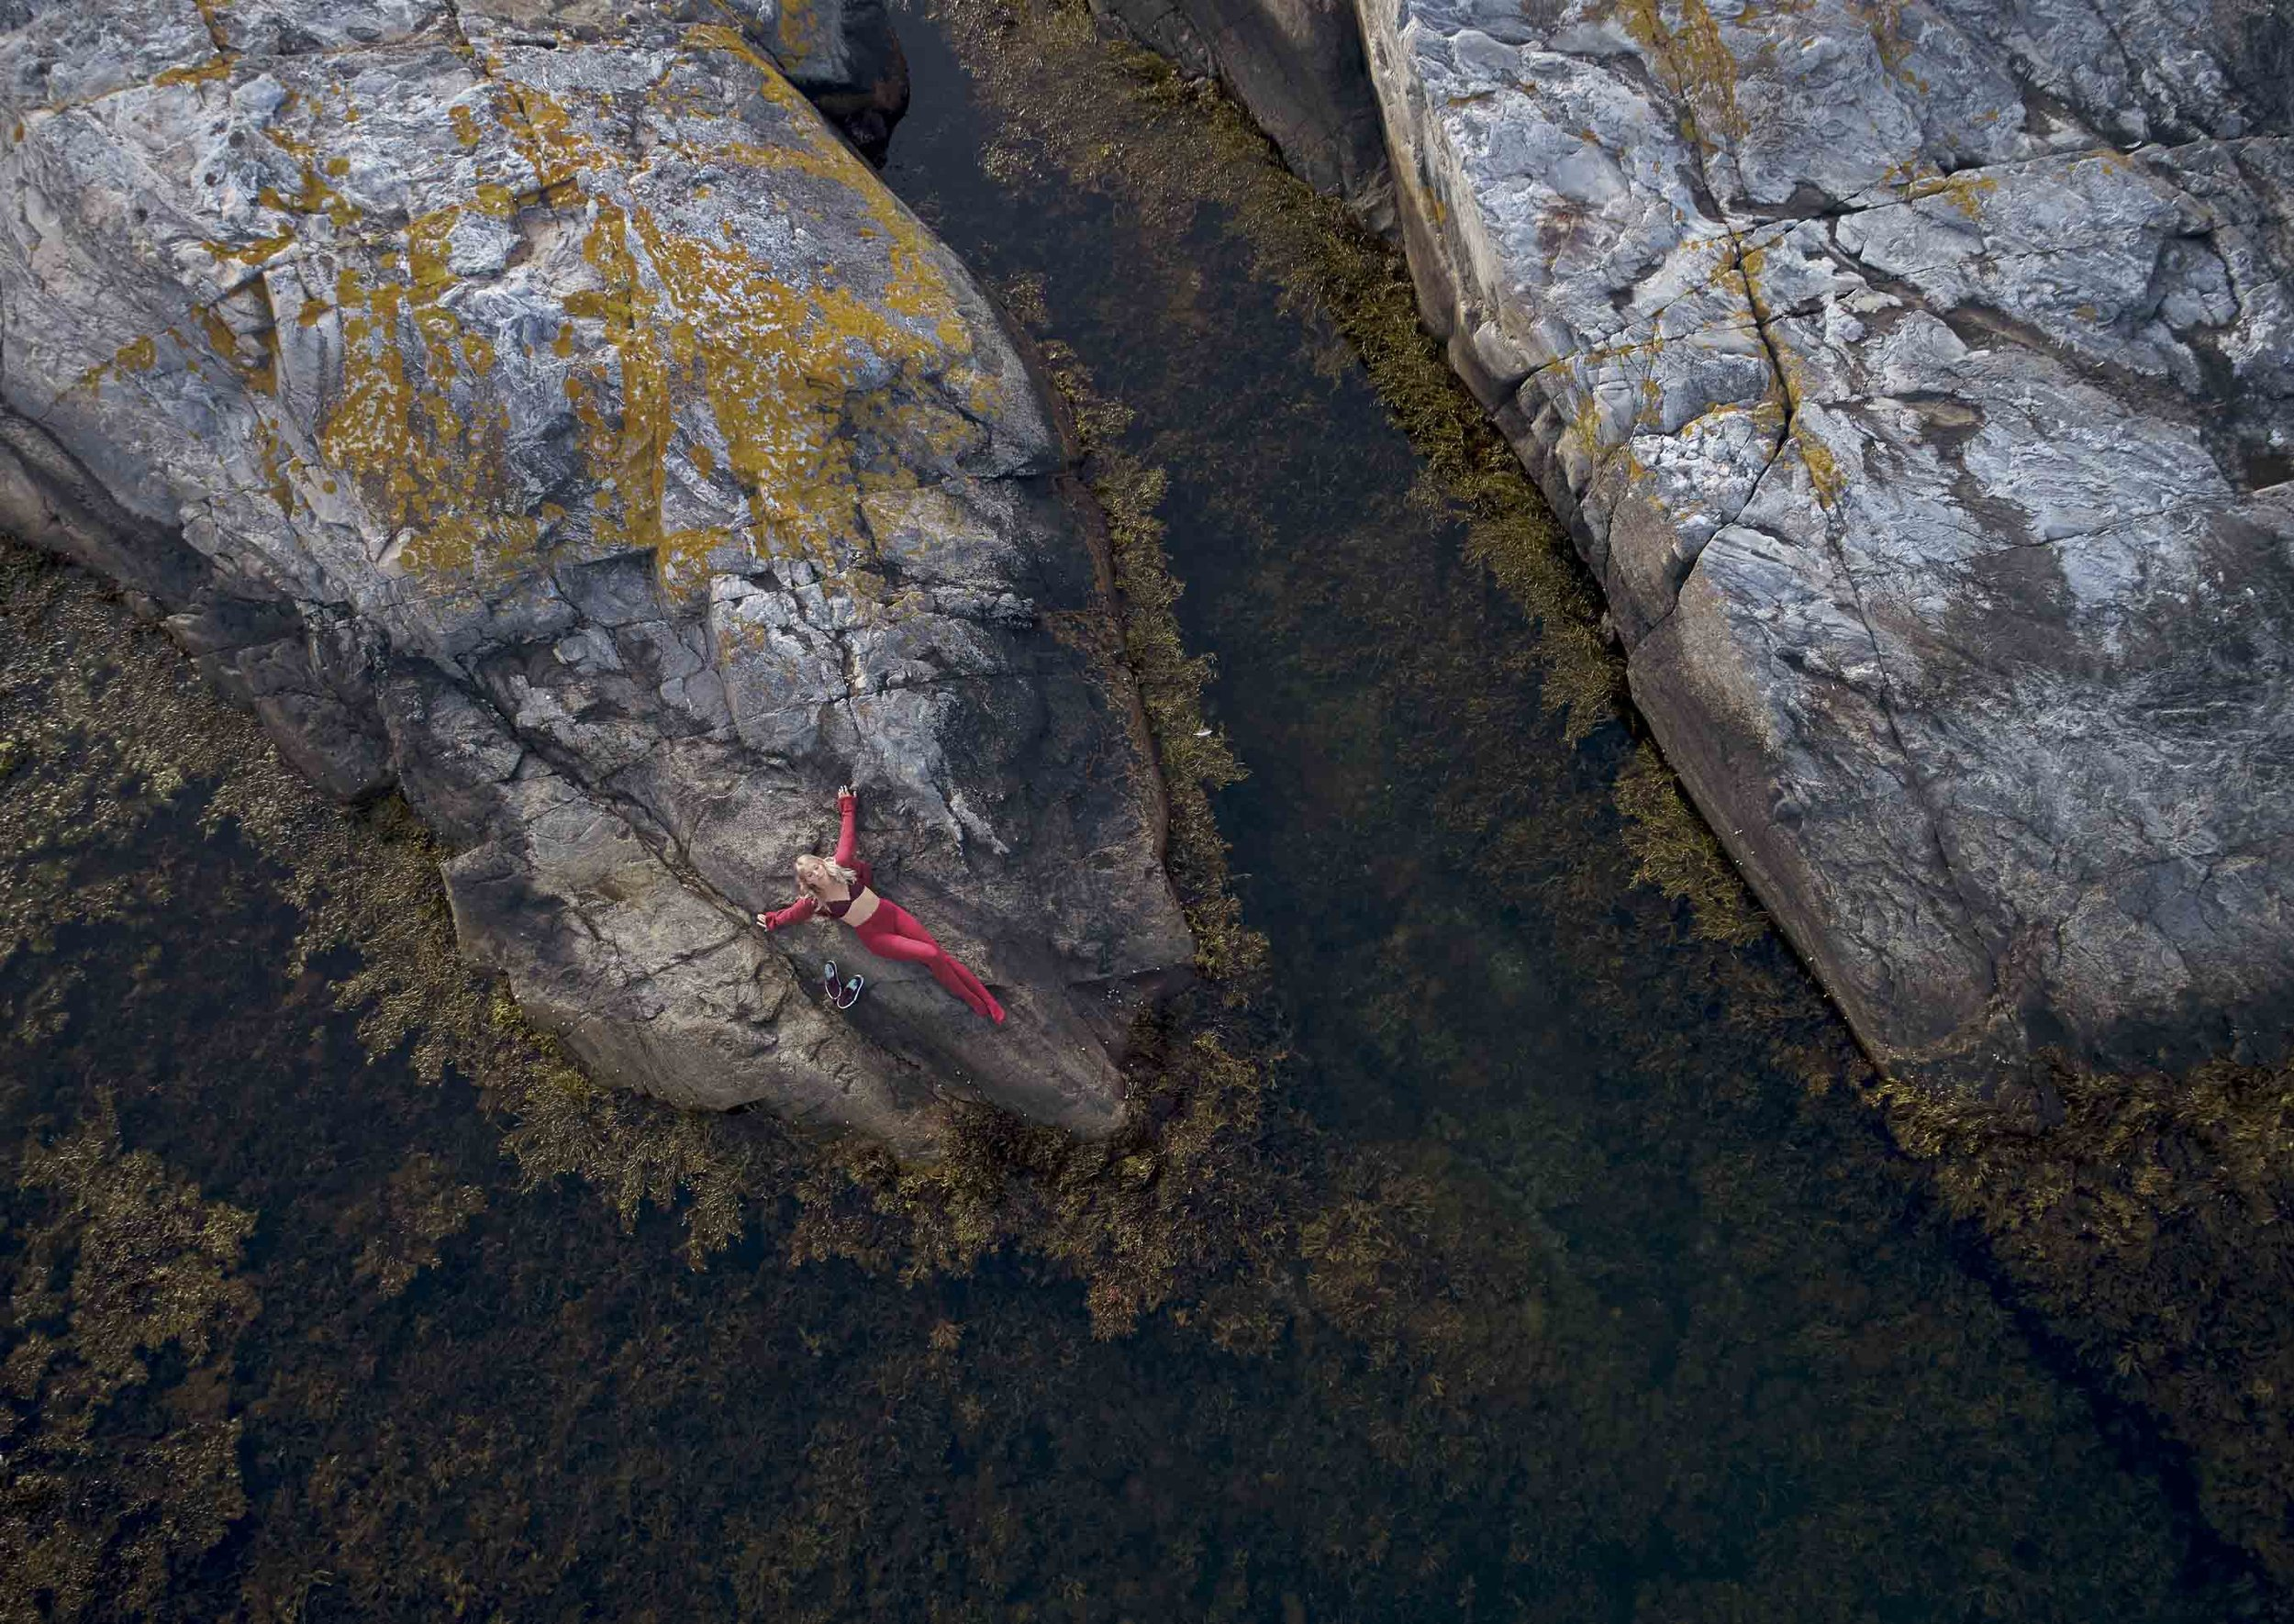 bauerfeind-venotrain-soft-campaign-coral-print_0523_RGB1_1.jpg